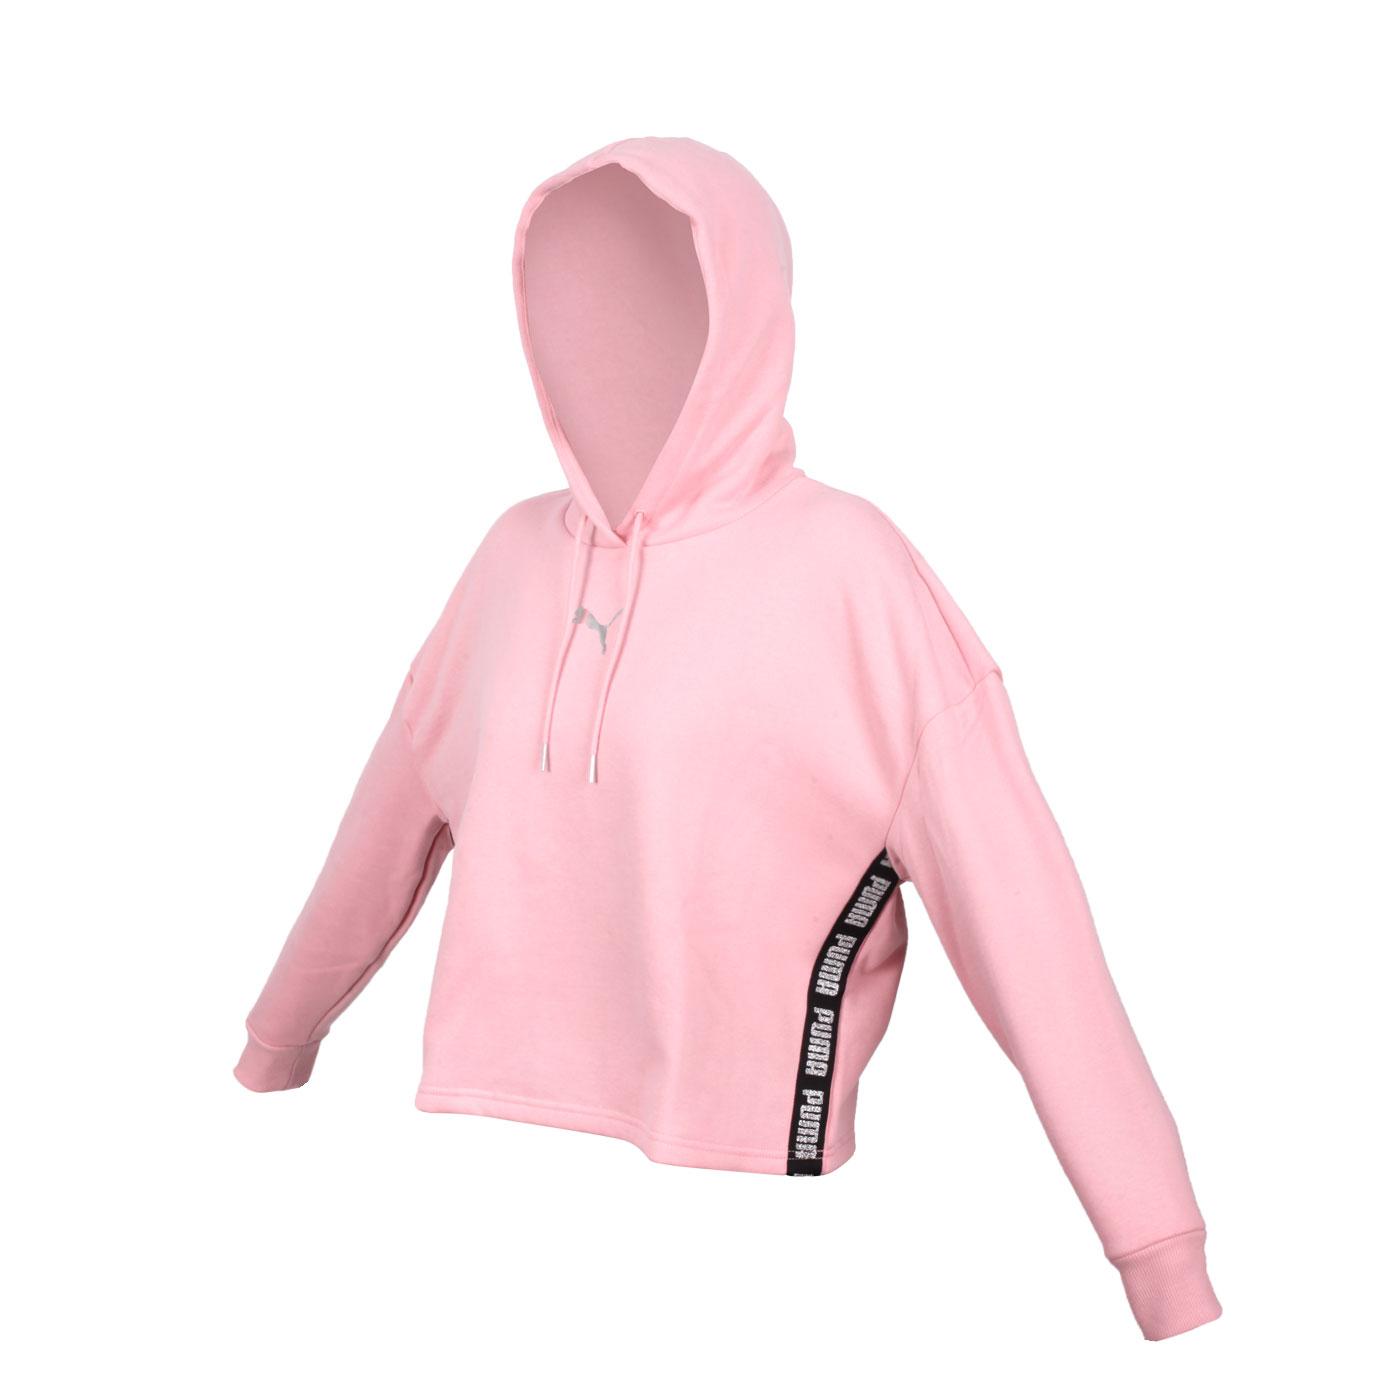 PUMA 女款長厚連帽T恤 58714814 - 玫瑰粉銀